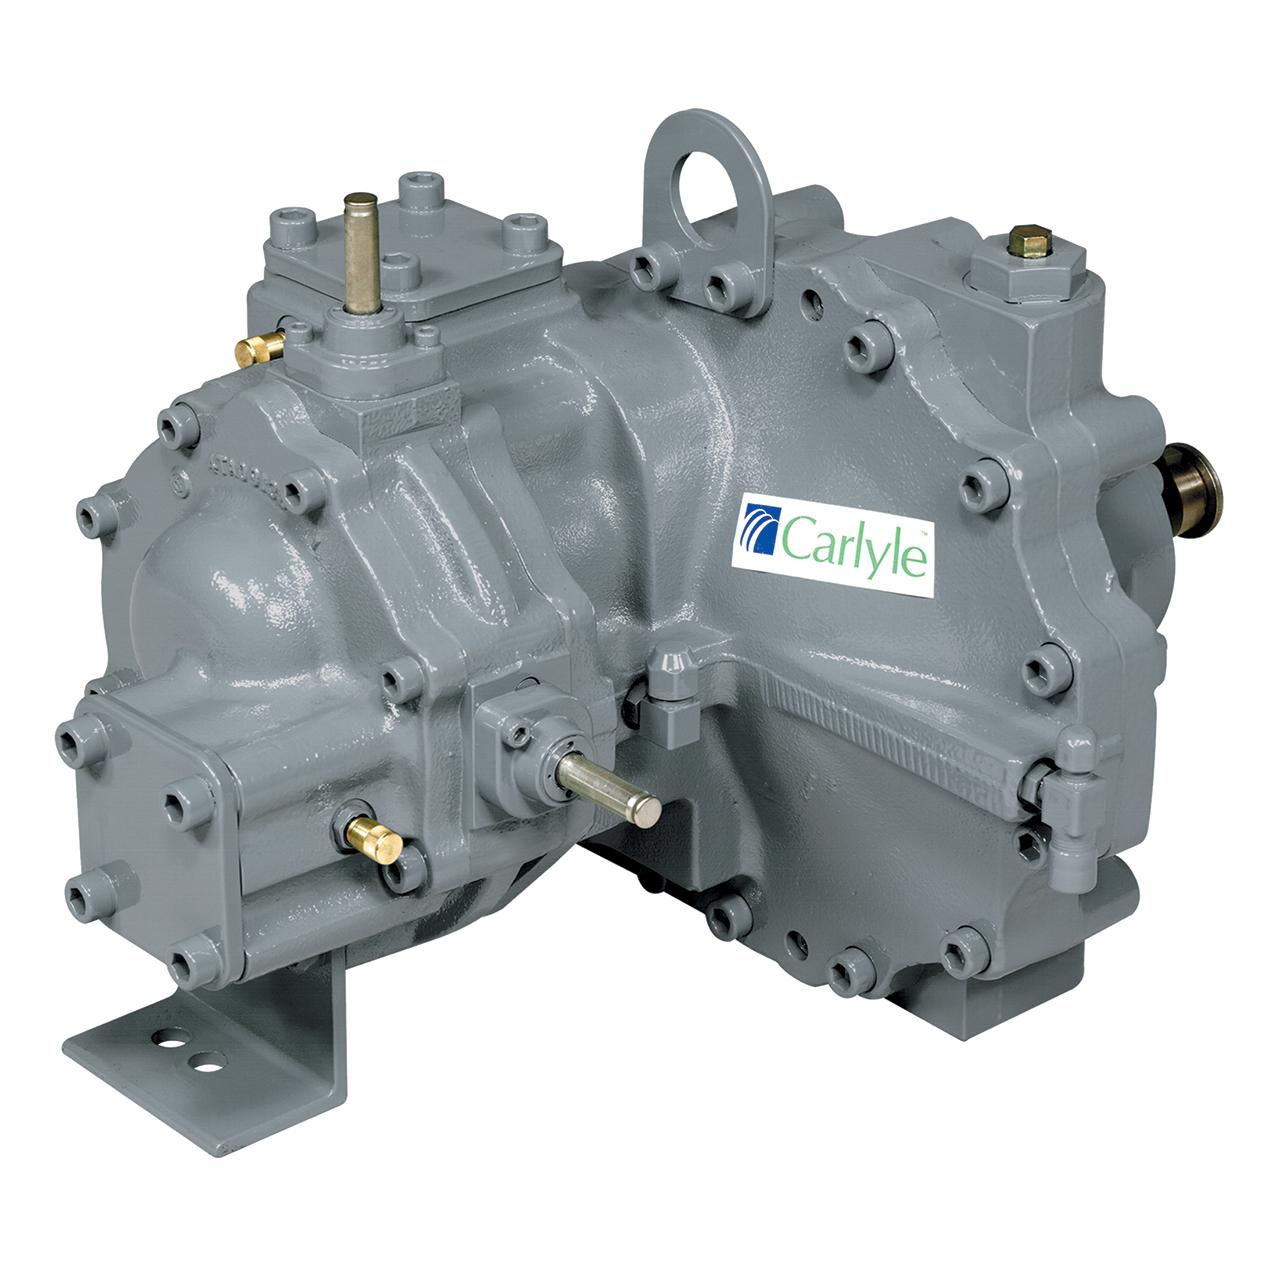 carlyle-compressor-05t